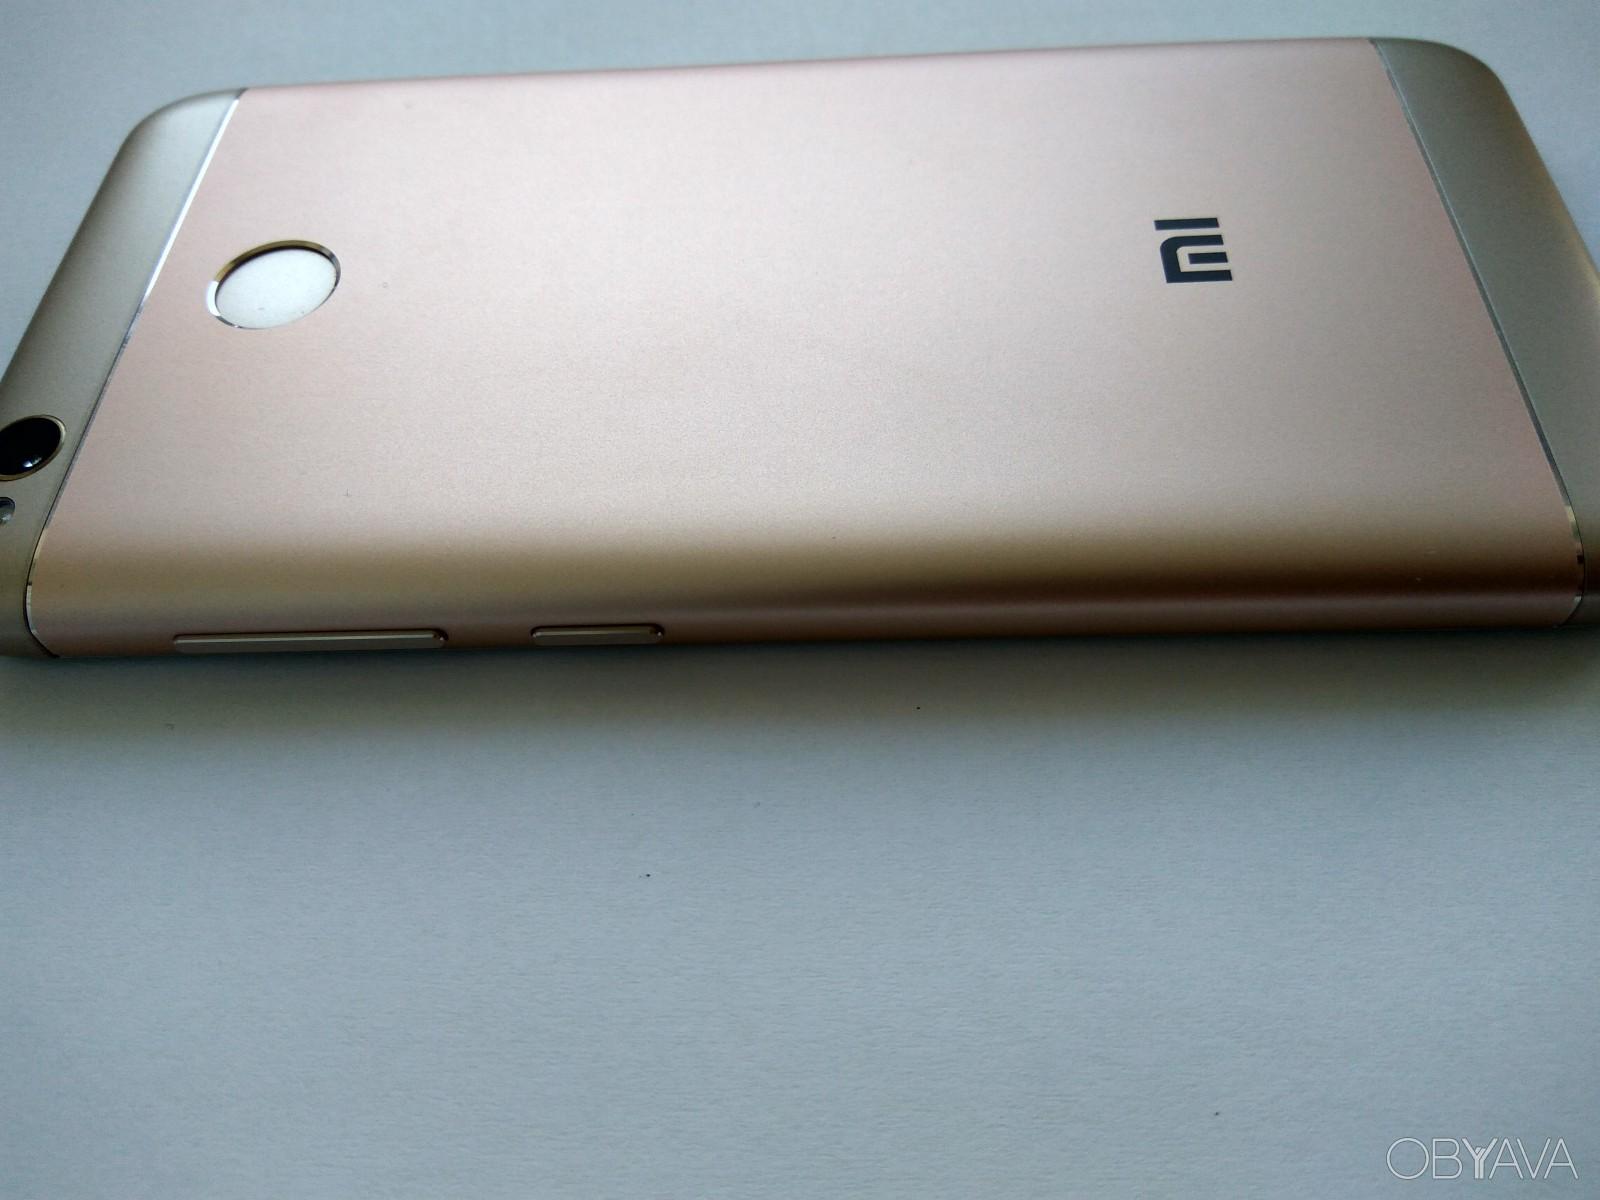 ᐈ продам Xiaomi Redmi 4x 464 ᐈ винница 3499 грн Obyava